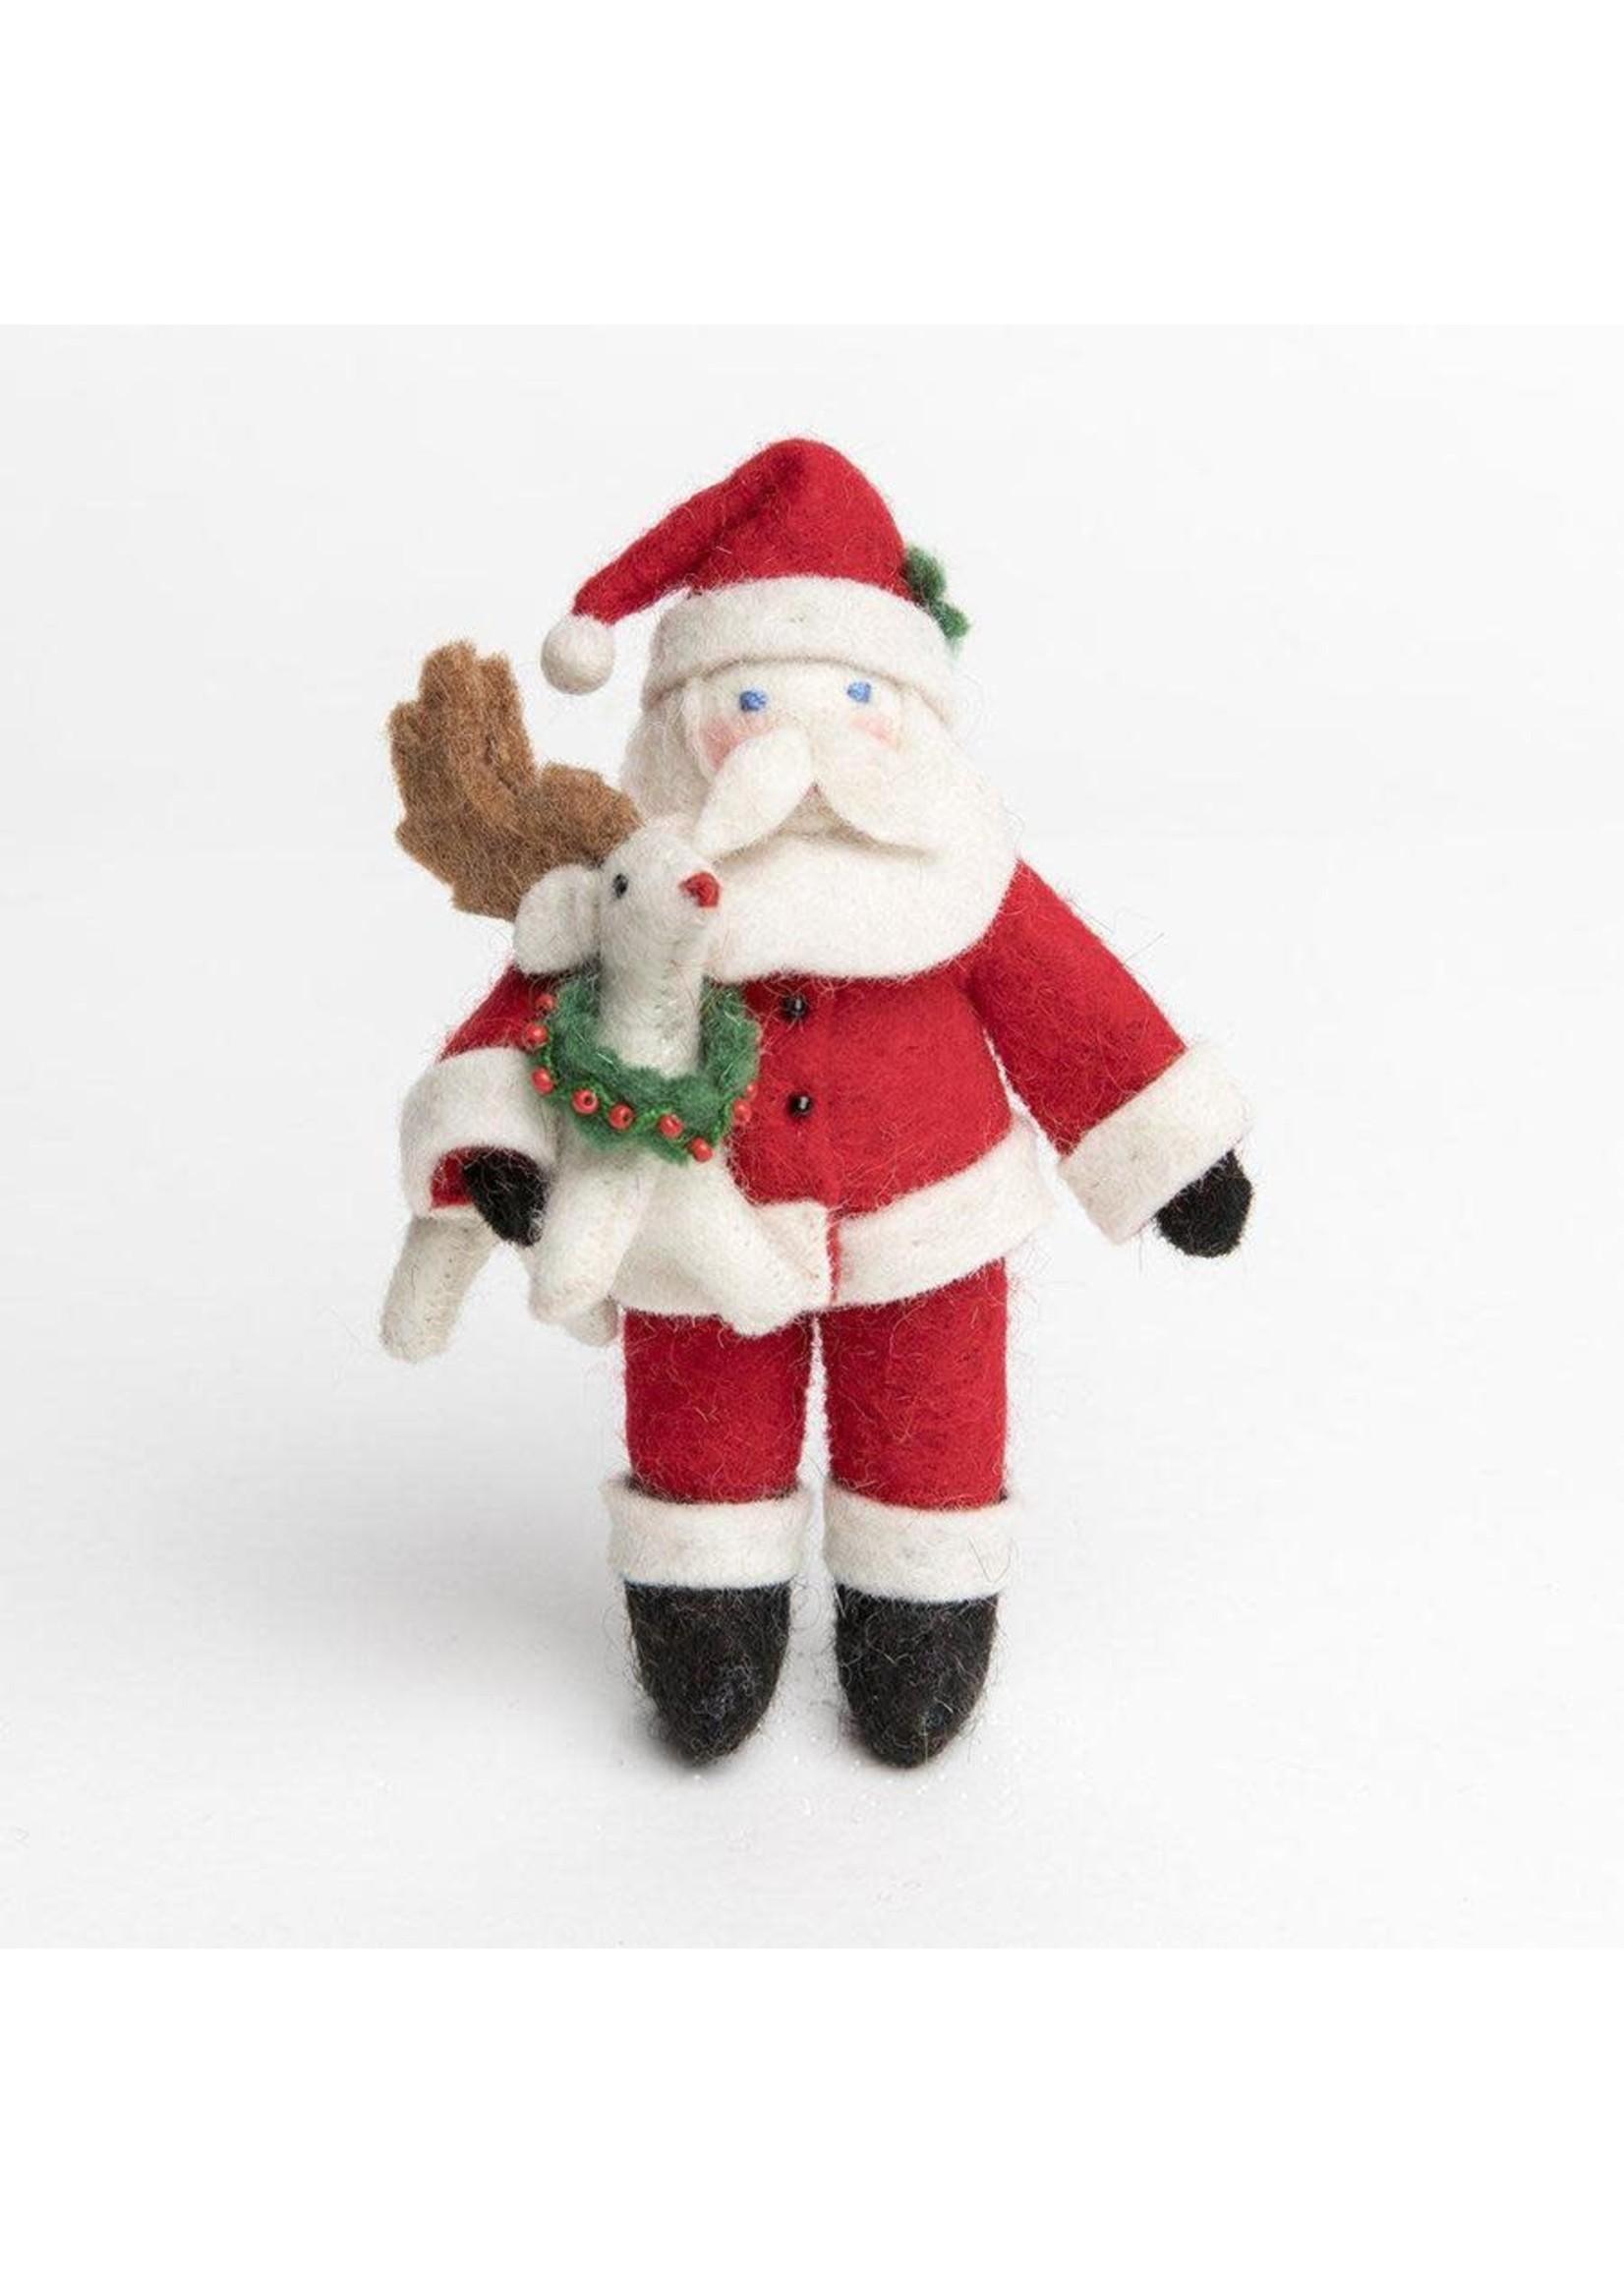 Ornament - Baby Rudolph Santa